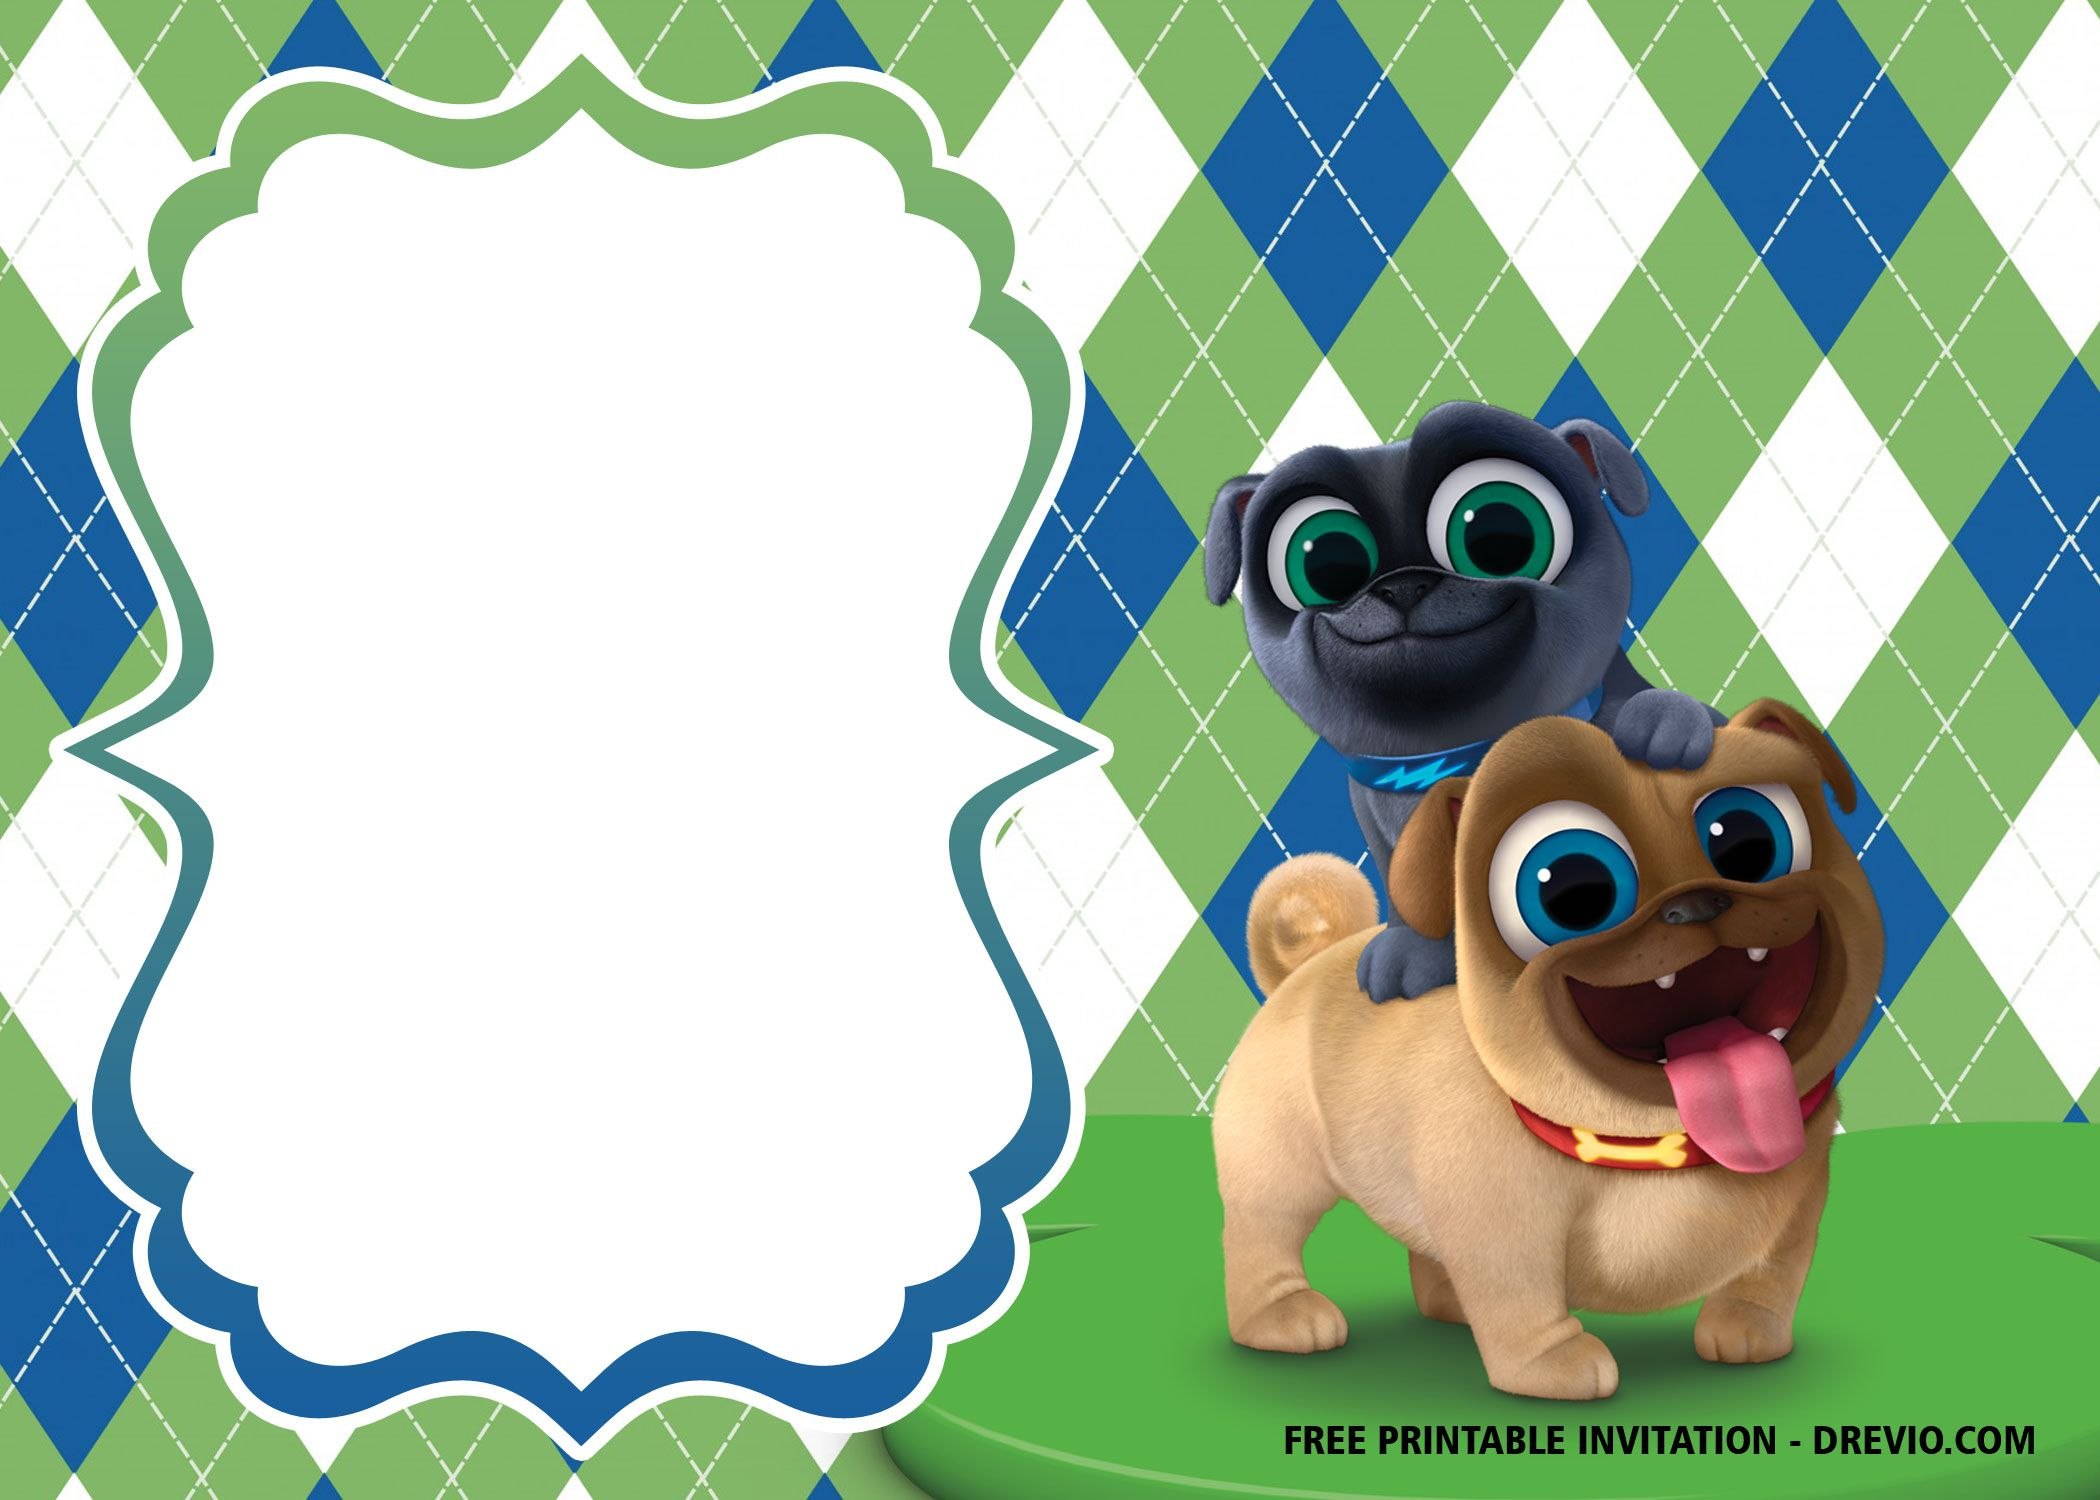 Free Disney Puppy Dog Pals Invitation Templates Dog Baby Shower Invitations Puppy Birthday Invitations Puppy Birthday Parties